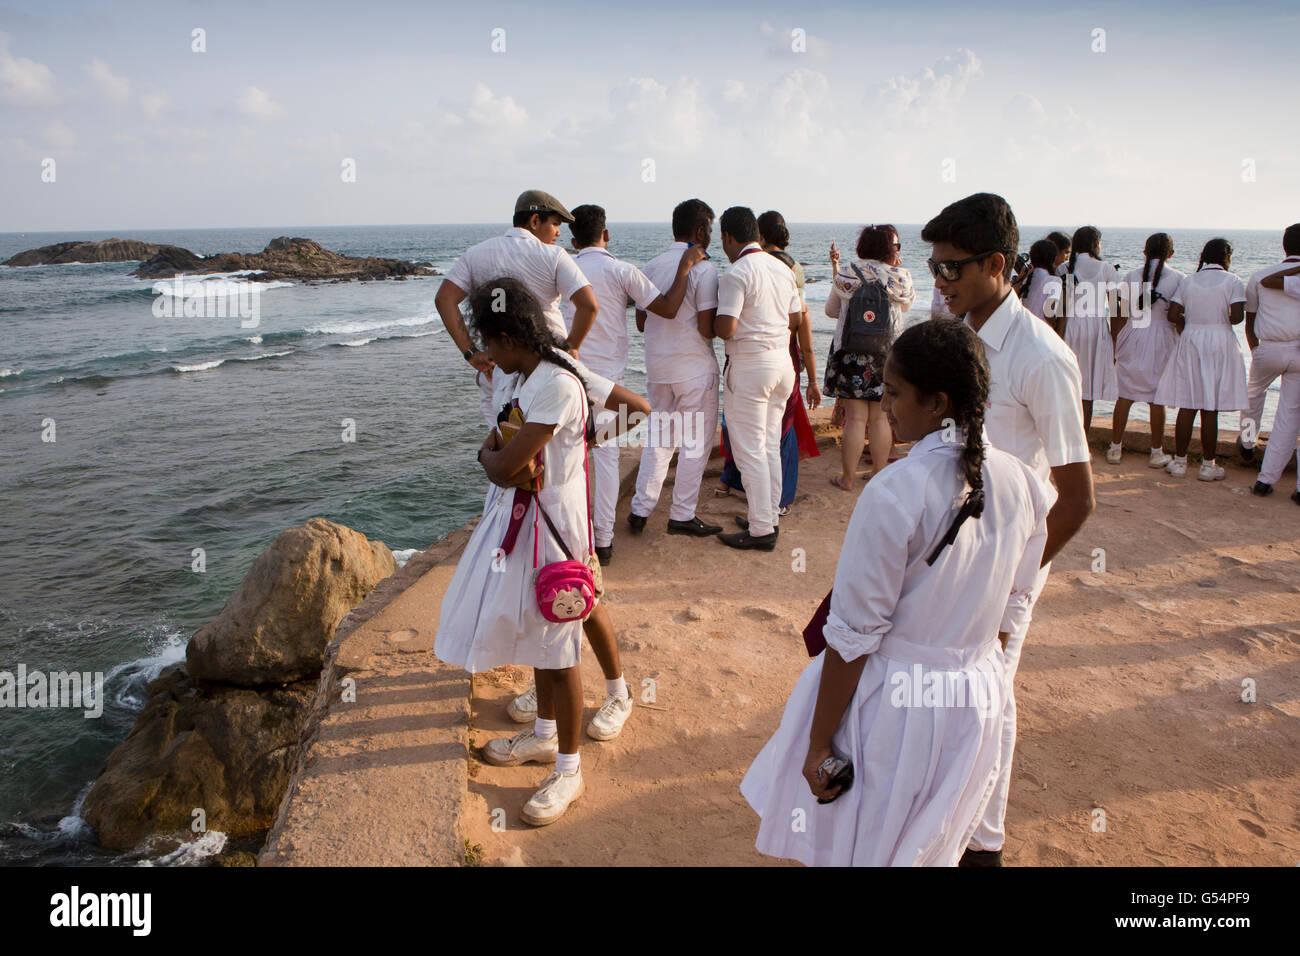 Sri Lanka, Galle Fort, group of secondary school children on Flag Rock ramparts overlooking sea - Stock Image